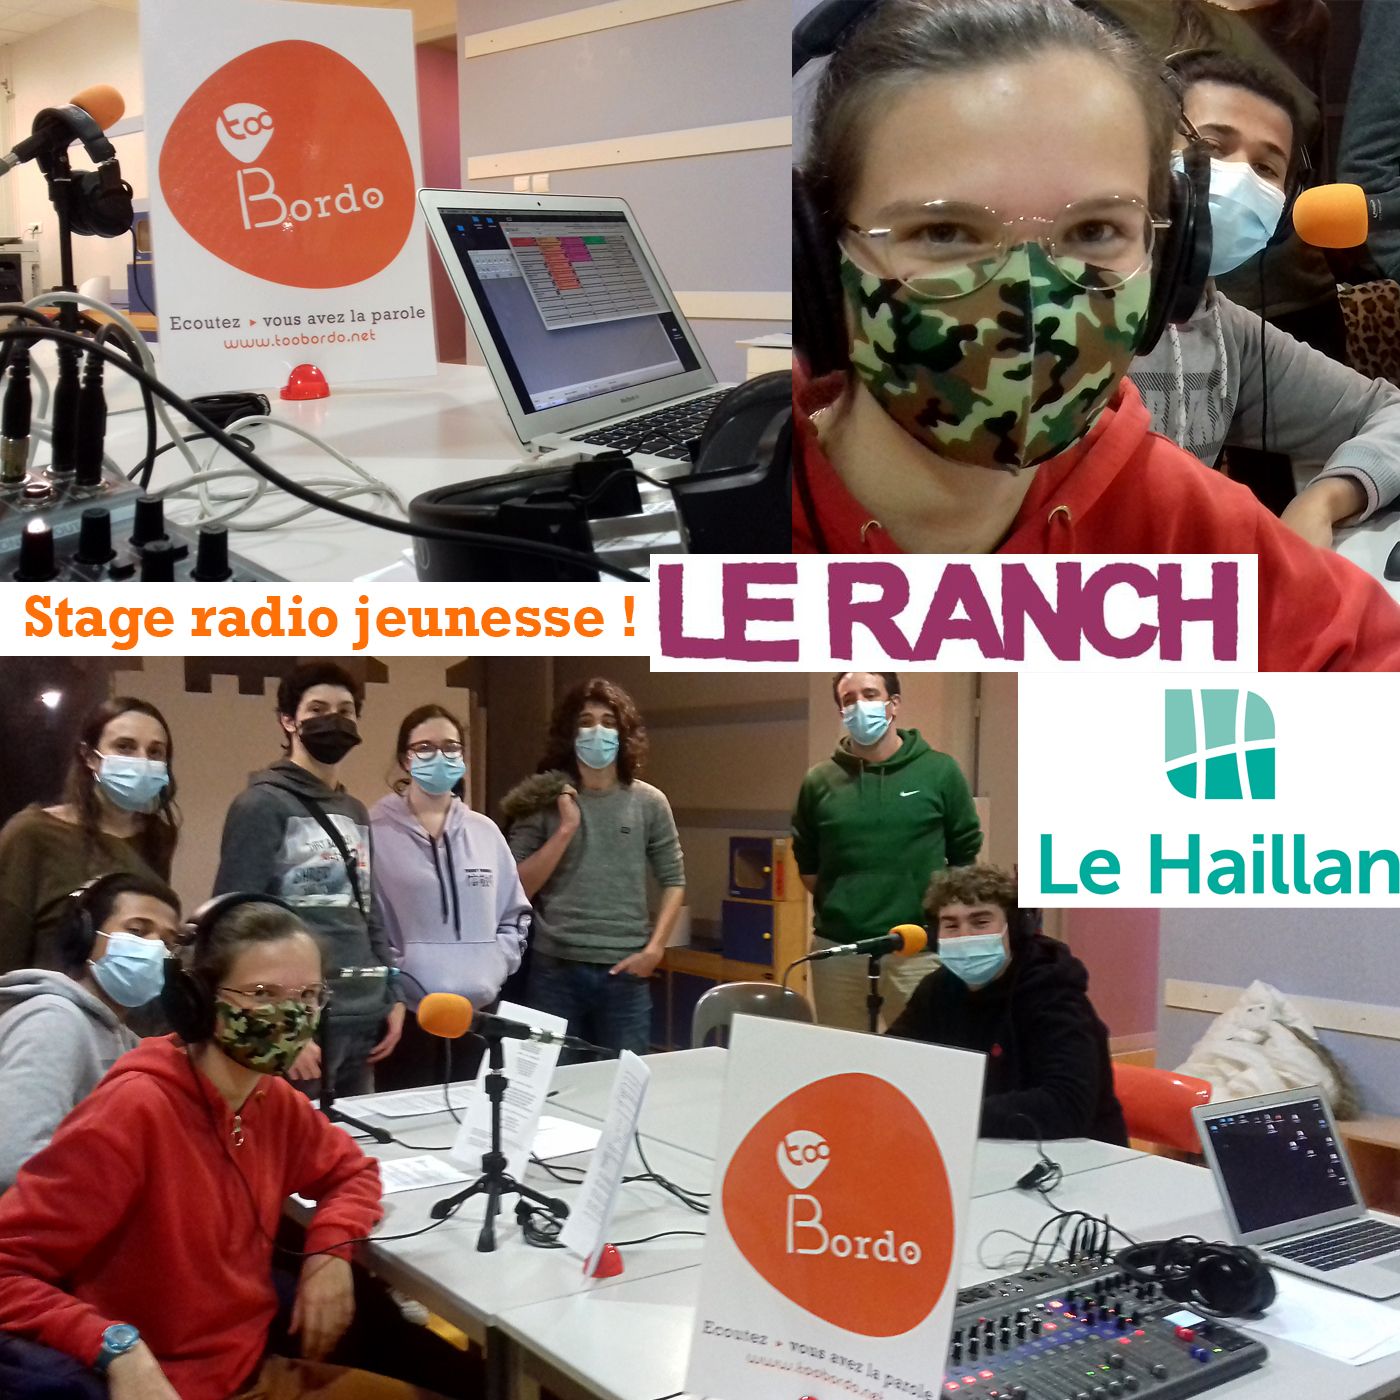 Webradio tooBordo : Stage radio avec les jeunes du Ranch du Haillan